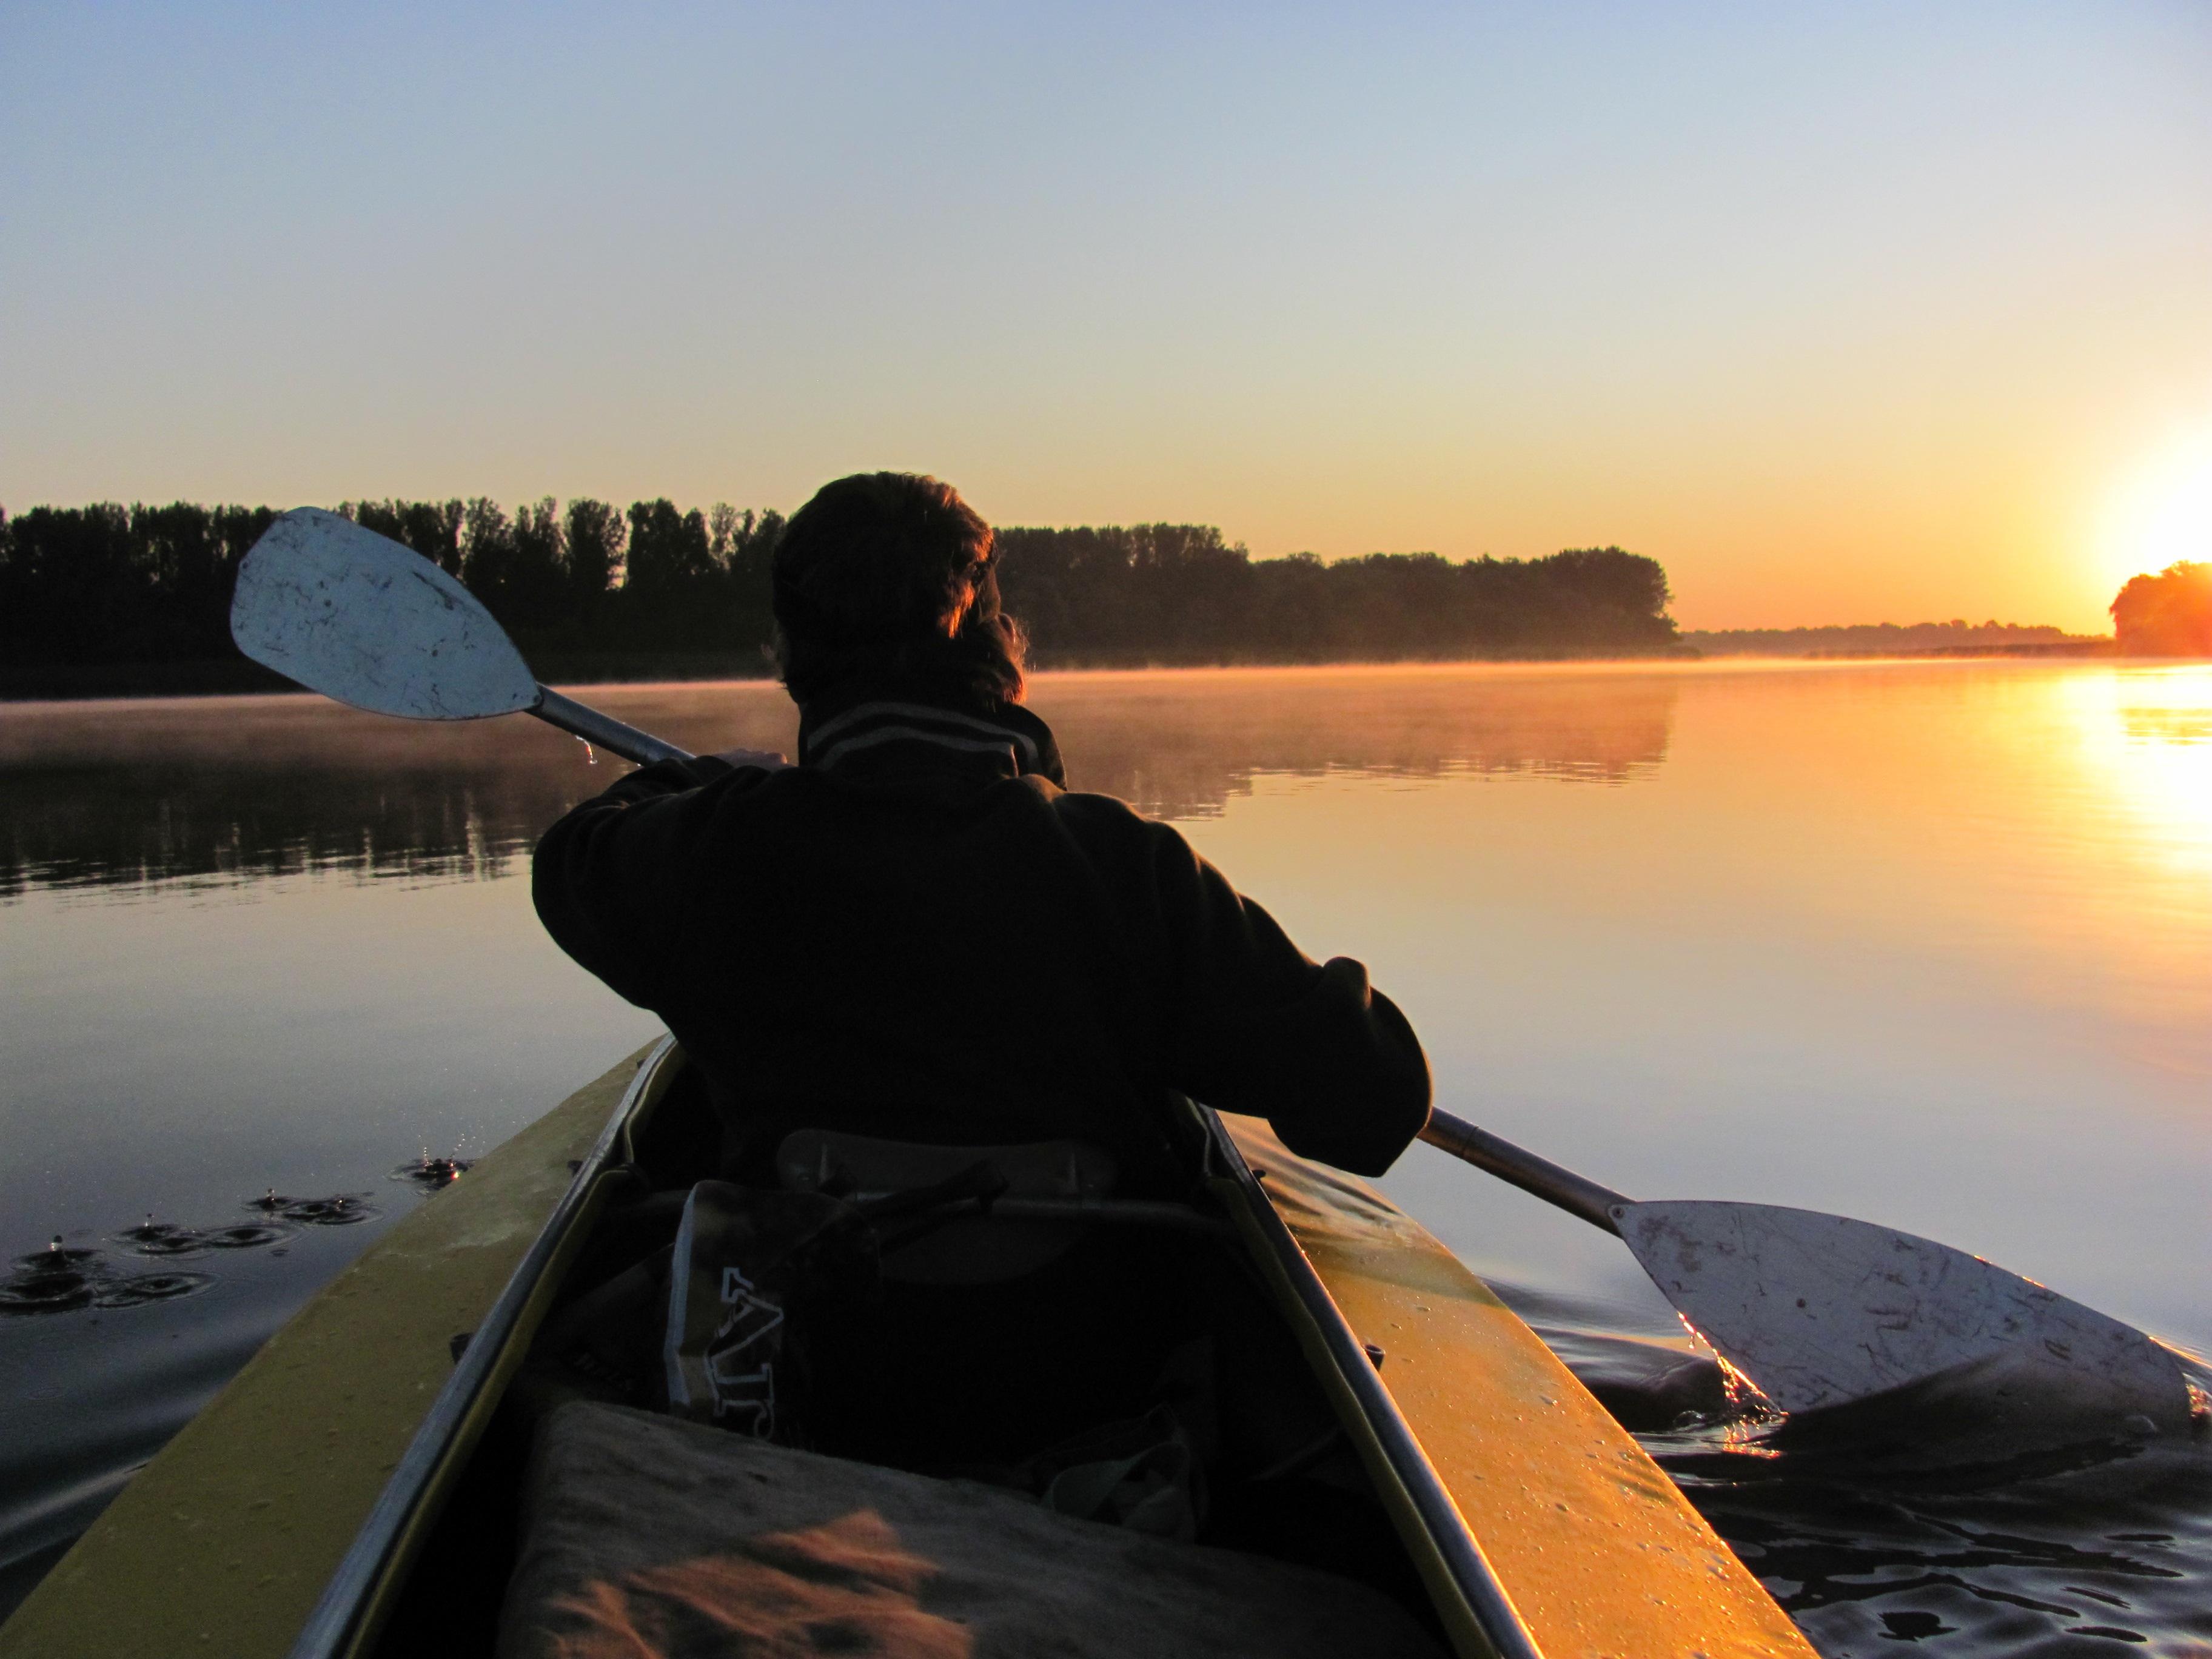 Free Images Landscape Nature Silhouette Sky Sun Sunrise Sunset Boat Sunlight Dawn River Photo Panorama Canoe Dusk Evening Paddle